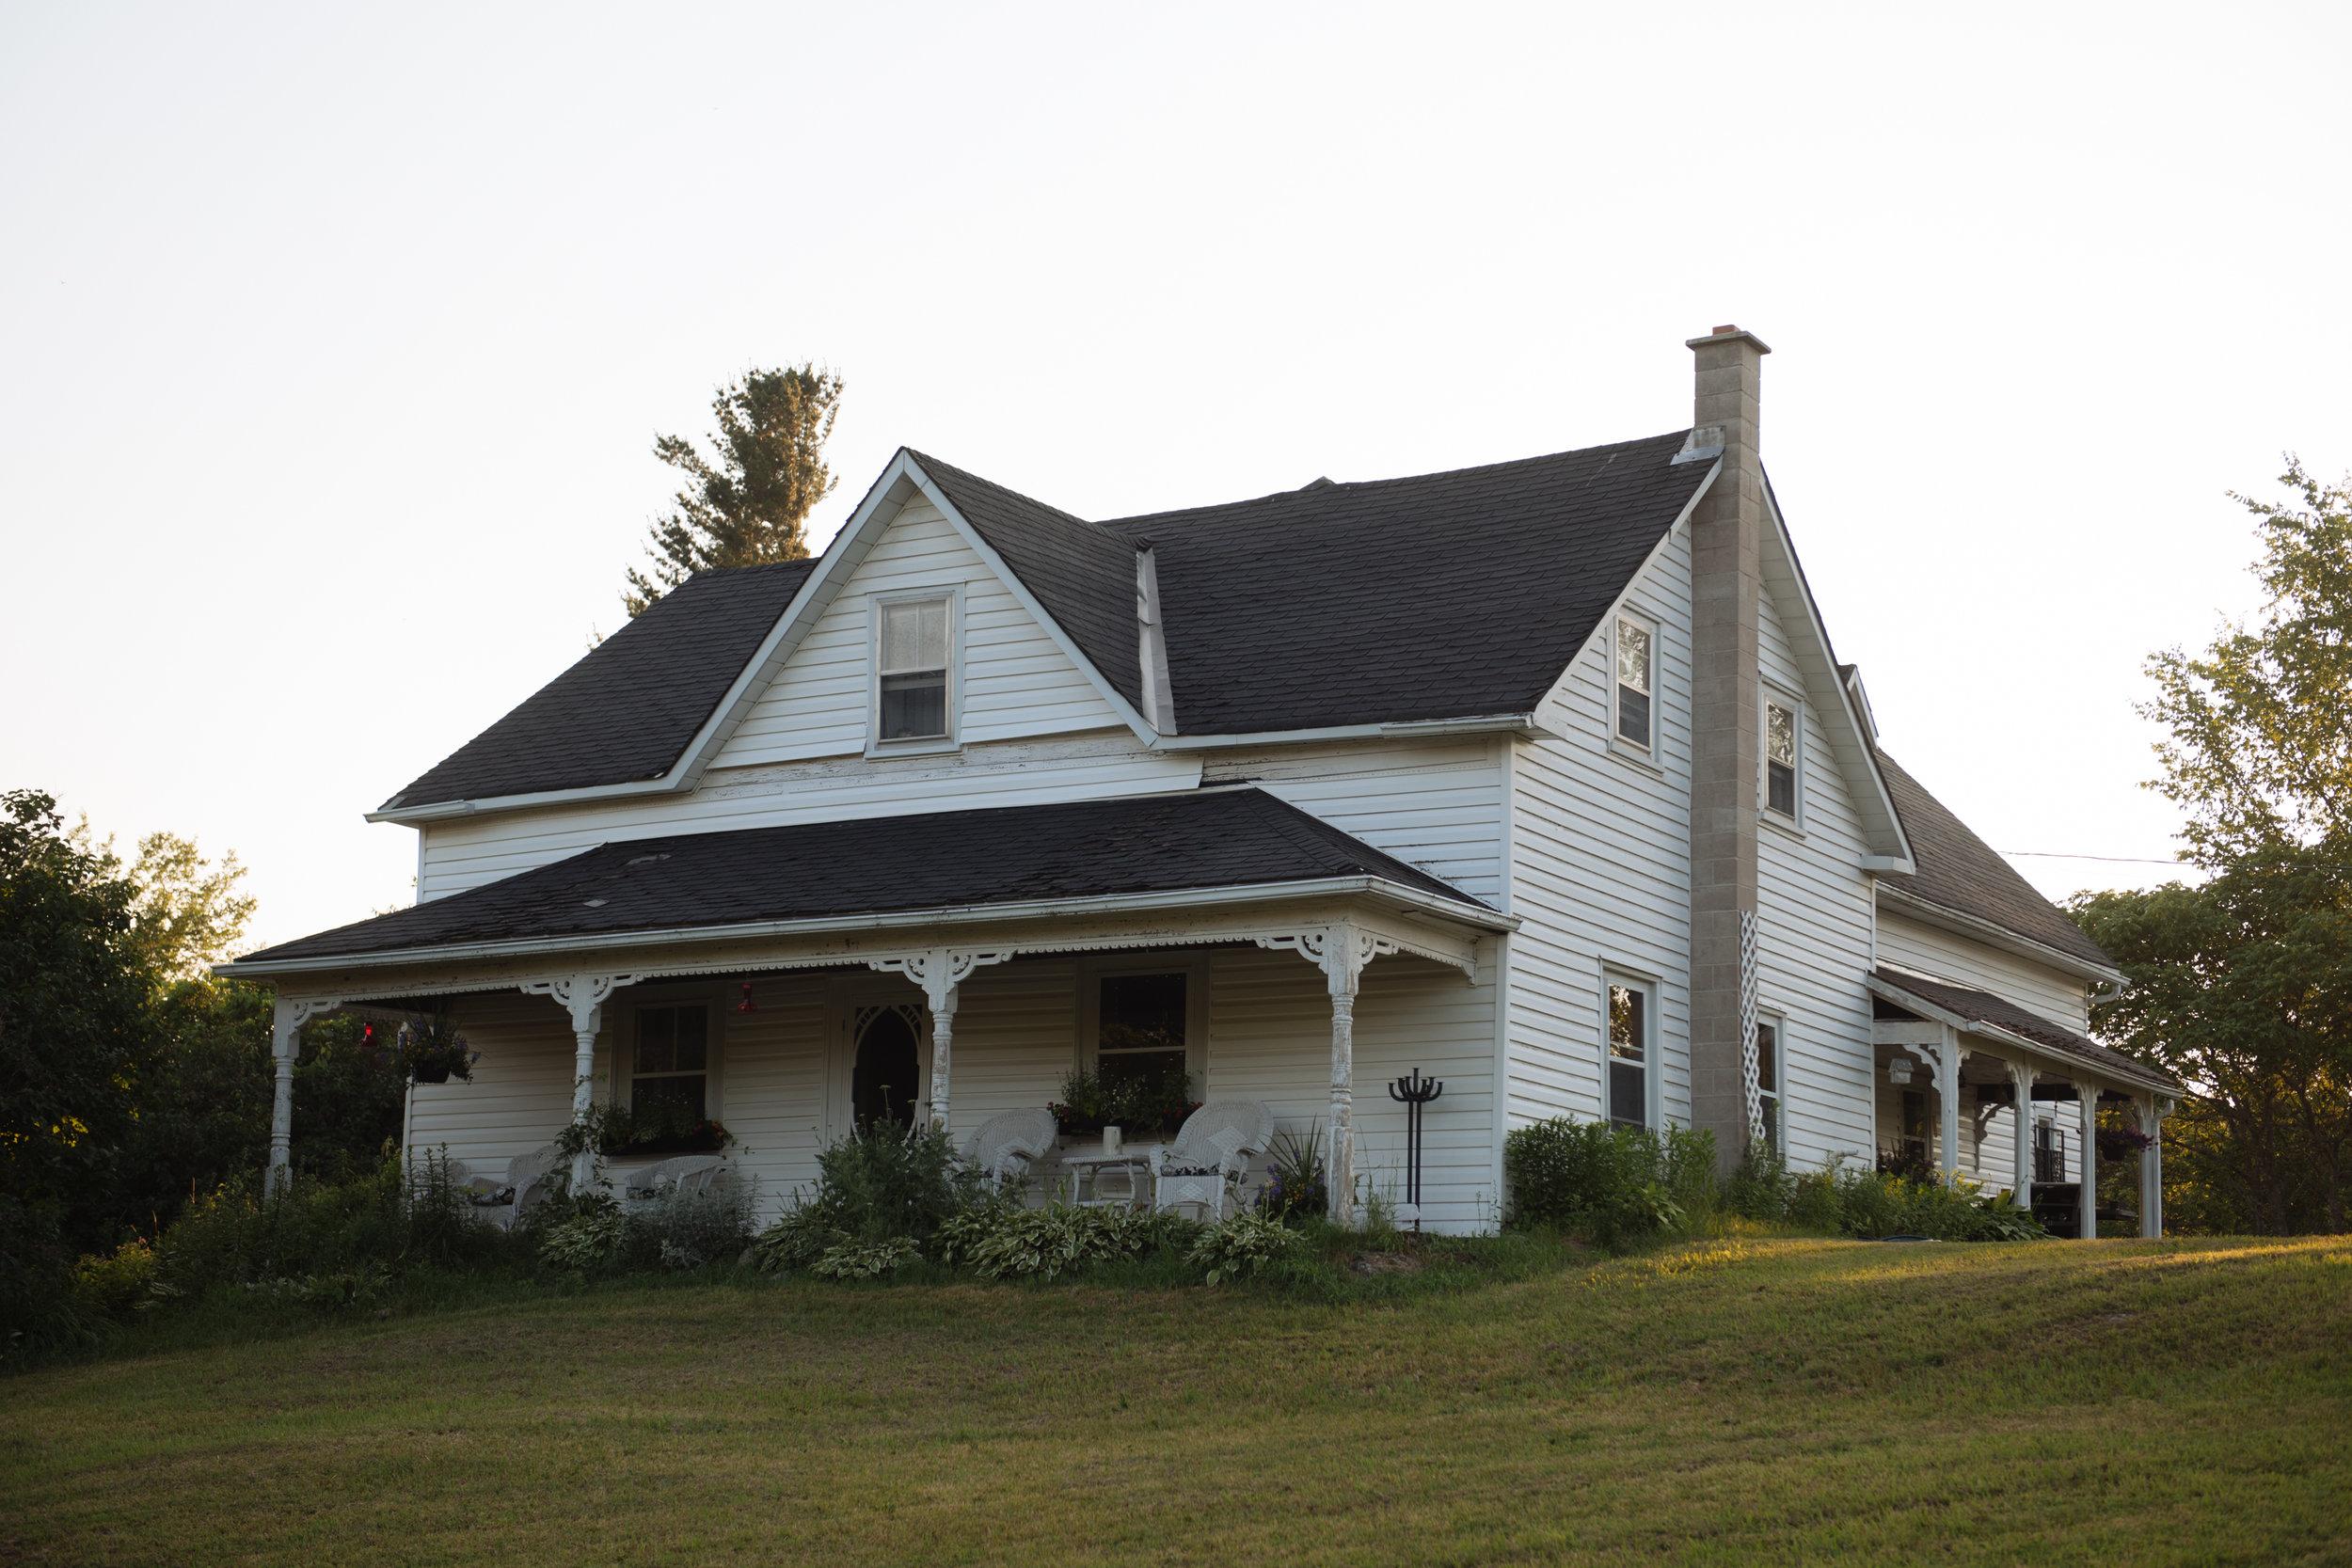 Rodan-Farmhouse-070719-322.jpg